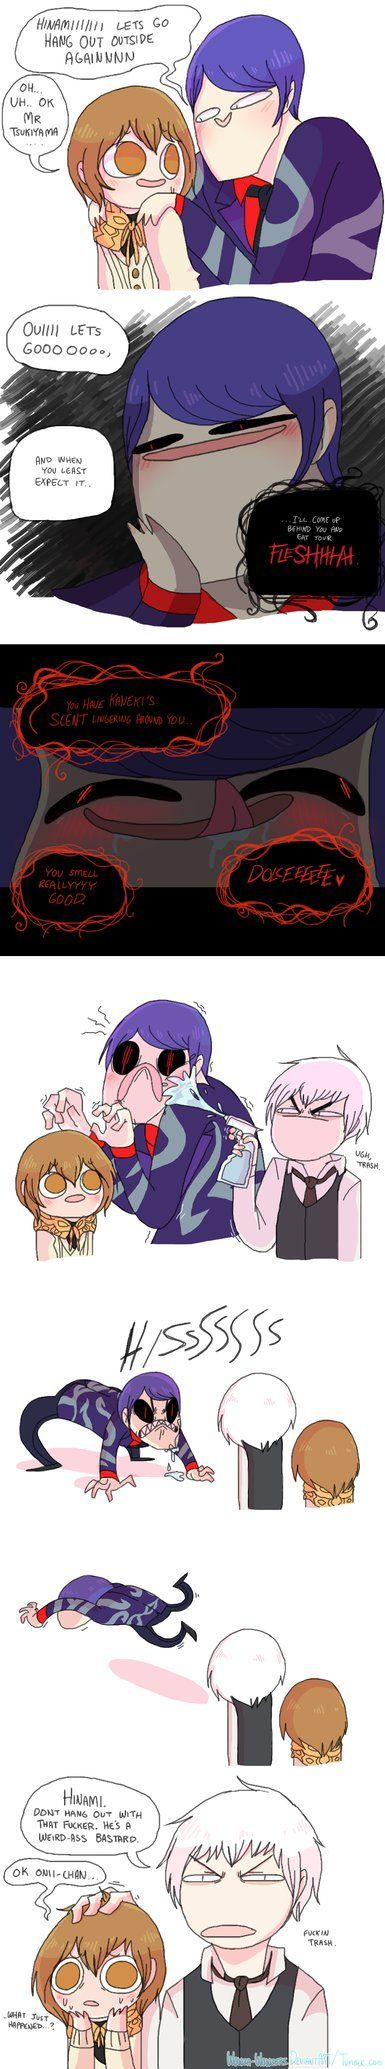 Tsukiyama Shuu    Tokyo Ghoul • Weird-ass Bastard• Now that I've watched the show it's even funnier